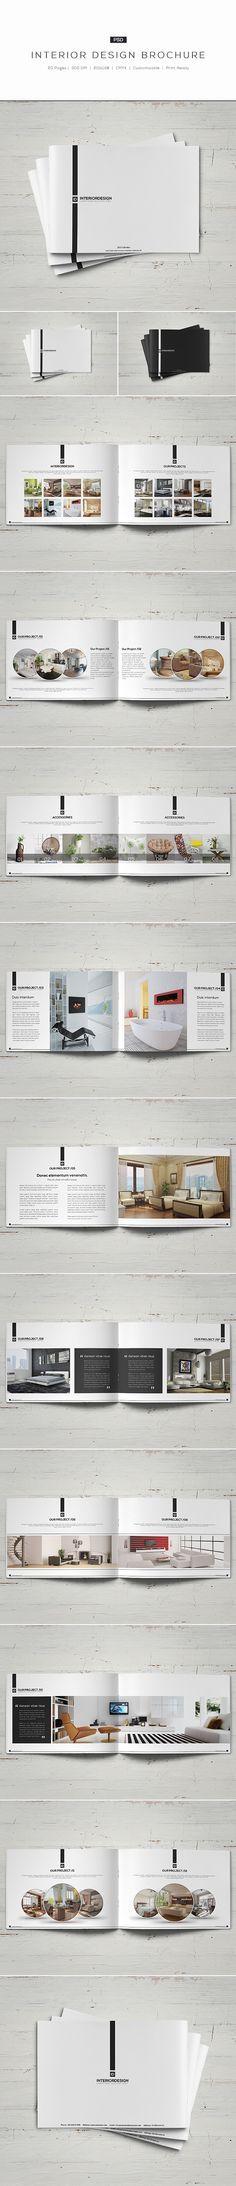 Interior Design Brochure on Behance - luxury brochure layout - interior design brochure template